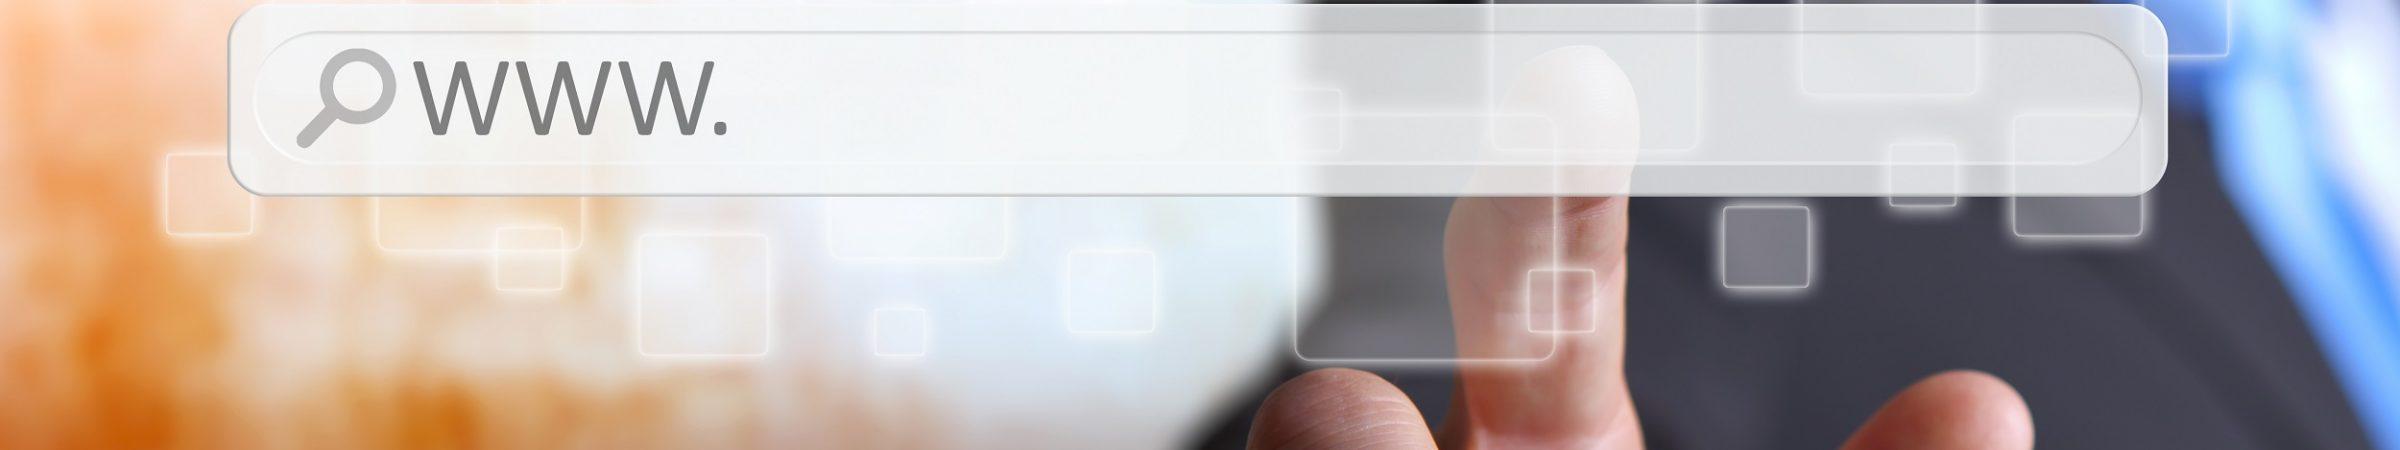 Man using tactile interface web address bar to surf on internet